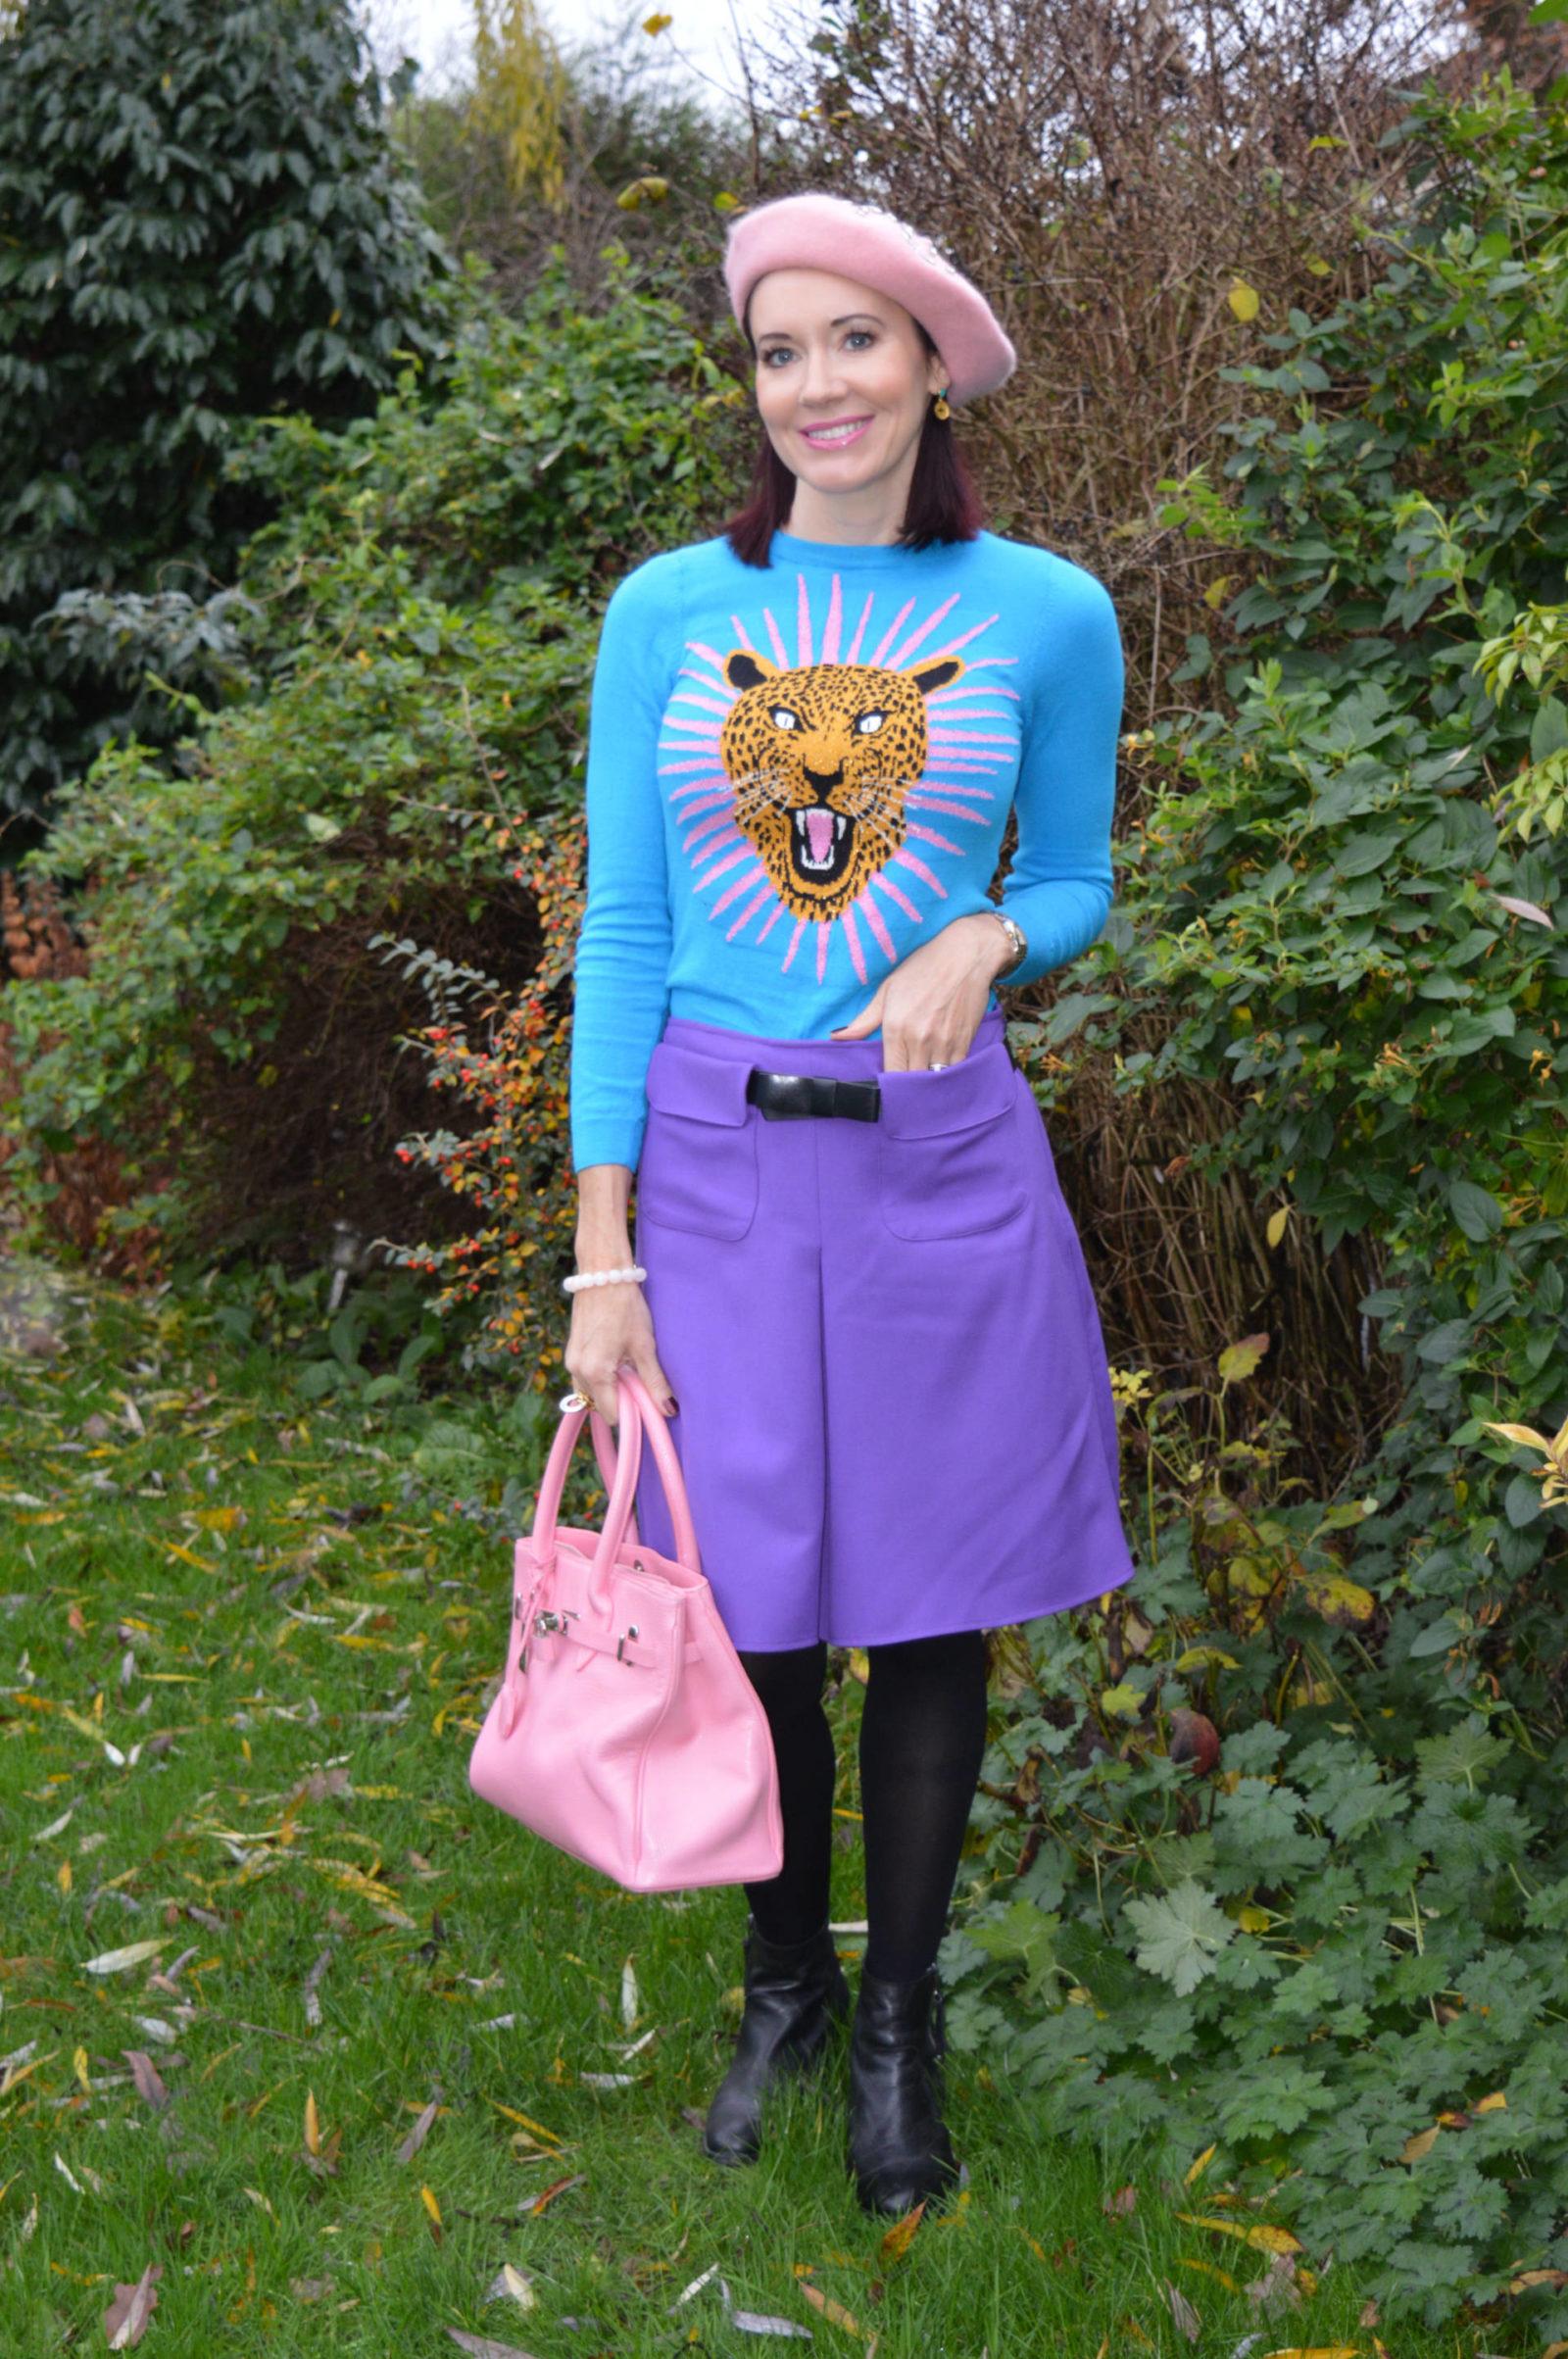 Monki jaguar jumper and purple A line skirt